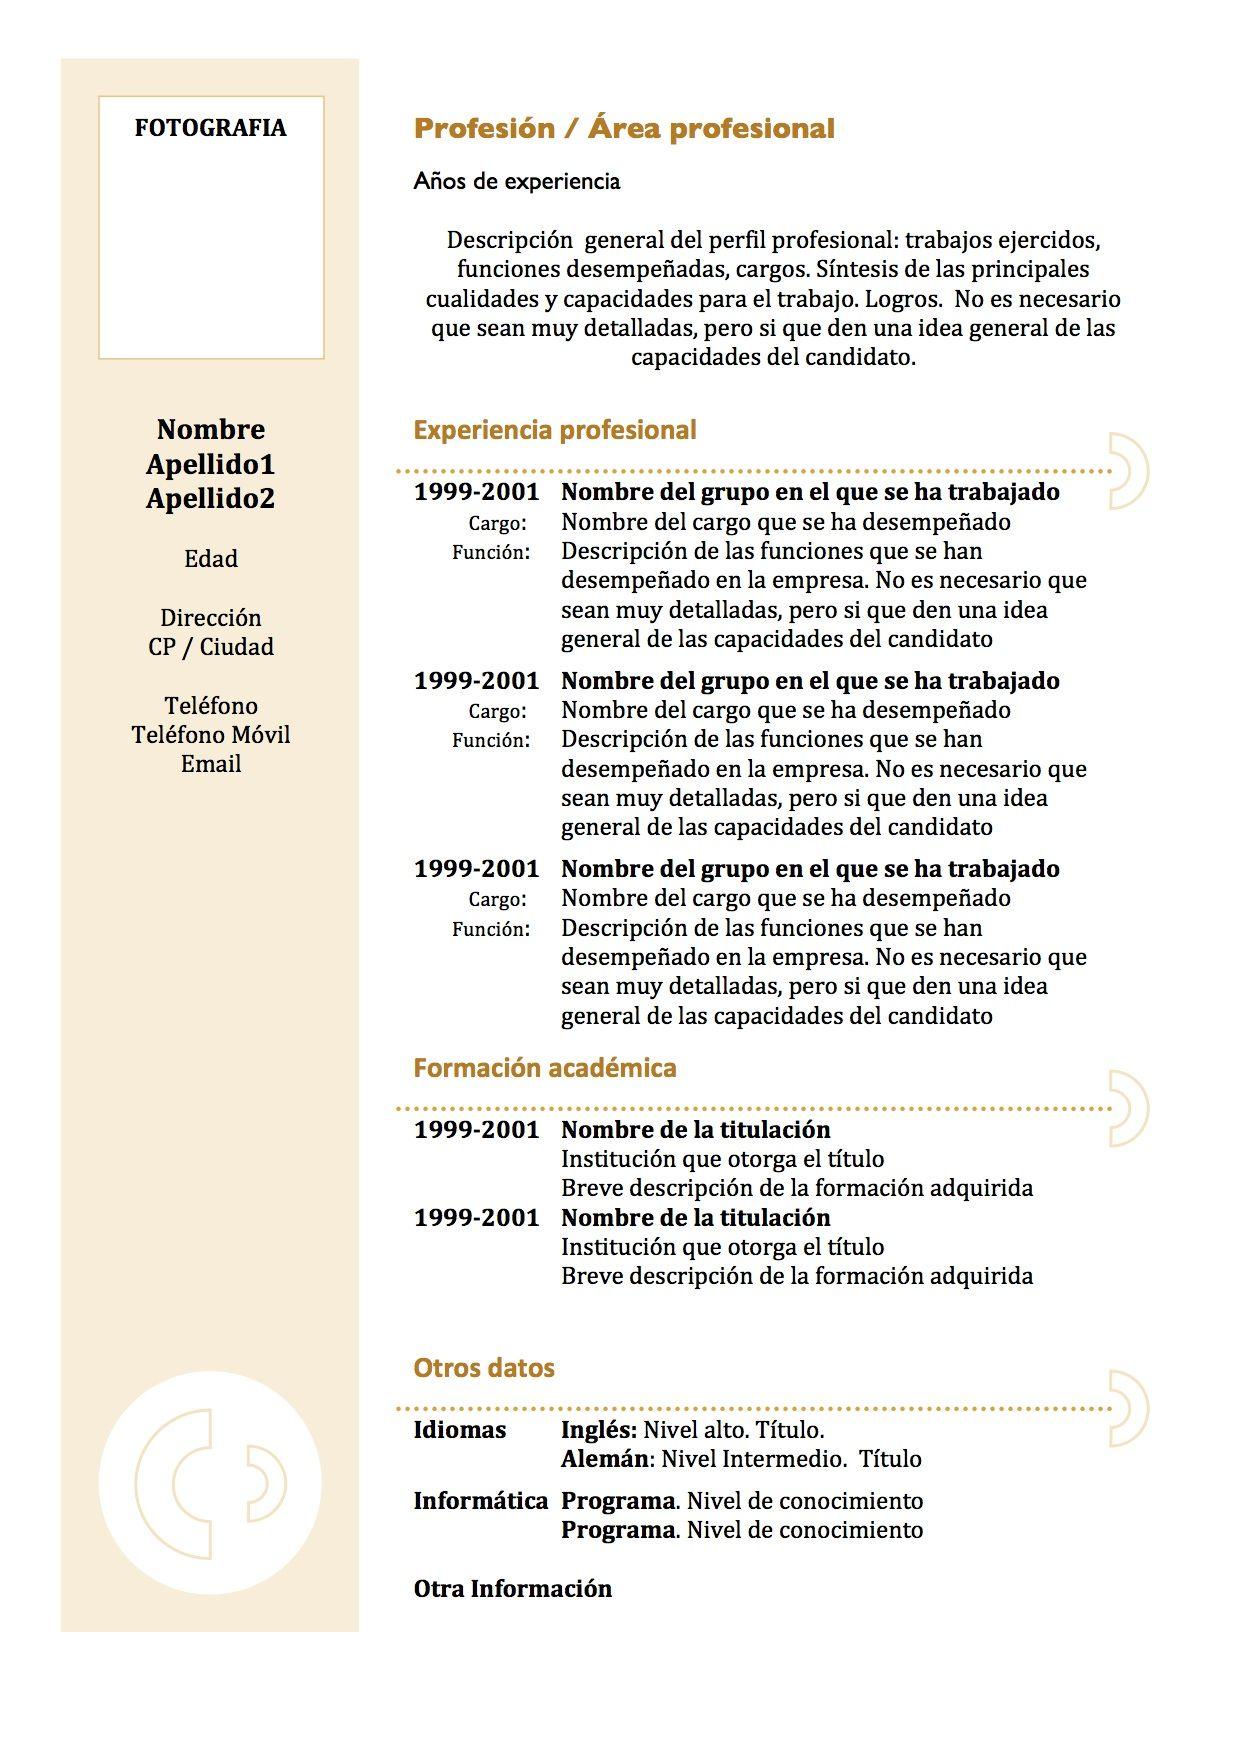 Pin de Fede Montenegro en cv funcional | Pinterest | Currículum ...